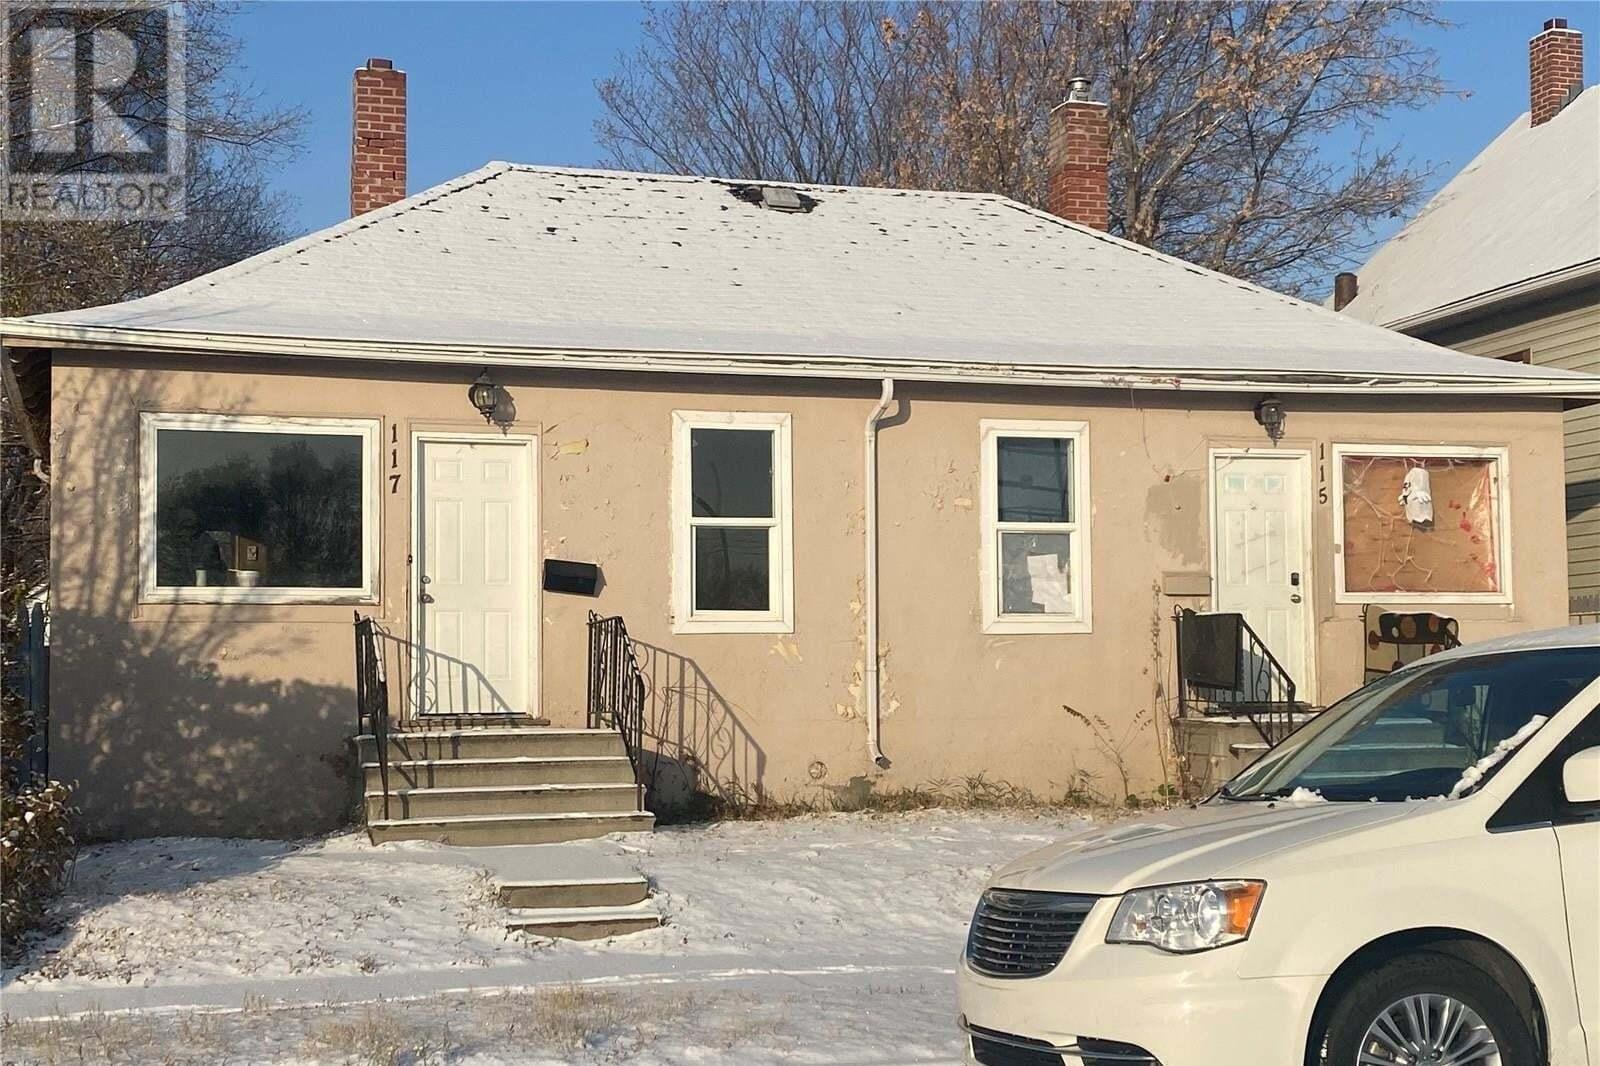 Townhouse for sale at 117 I Ave S Unit 115 Saskatoon Saskatchewan - MLS: SK830965